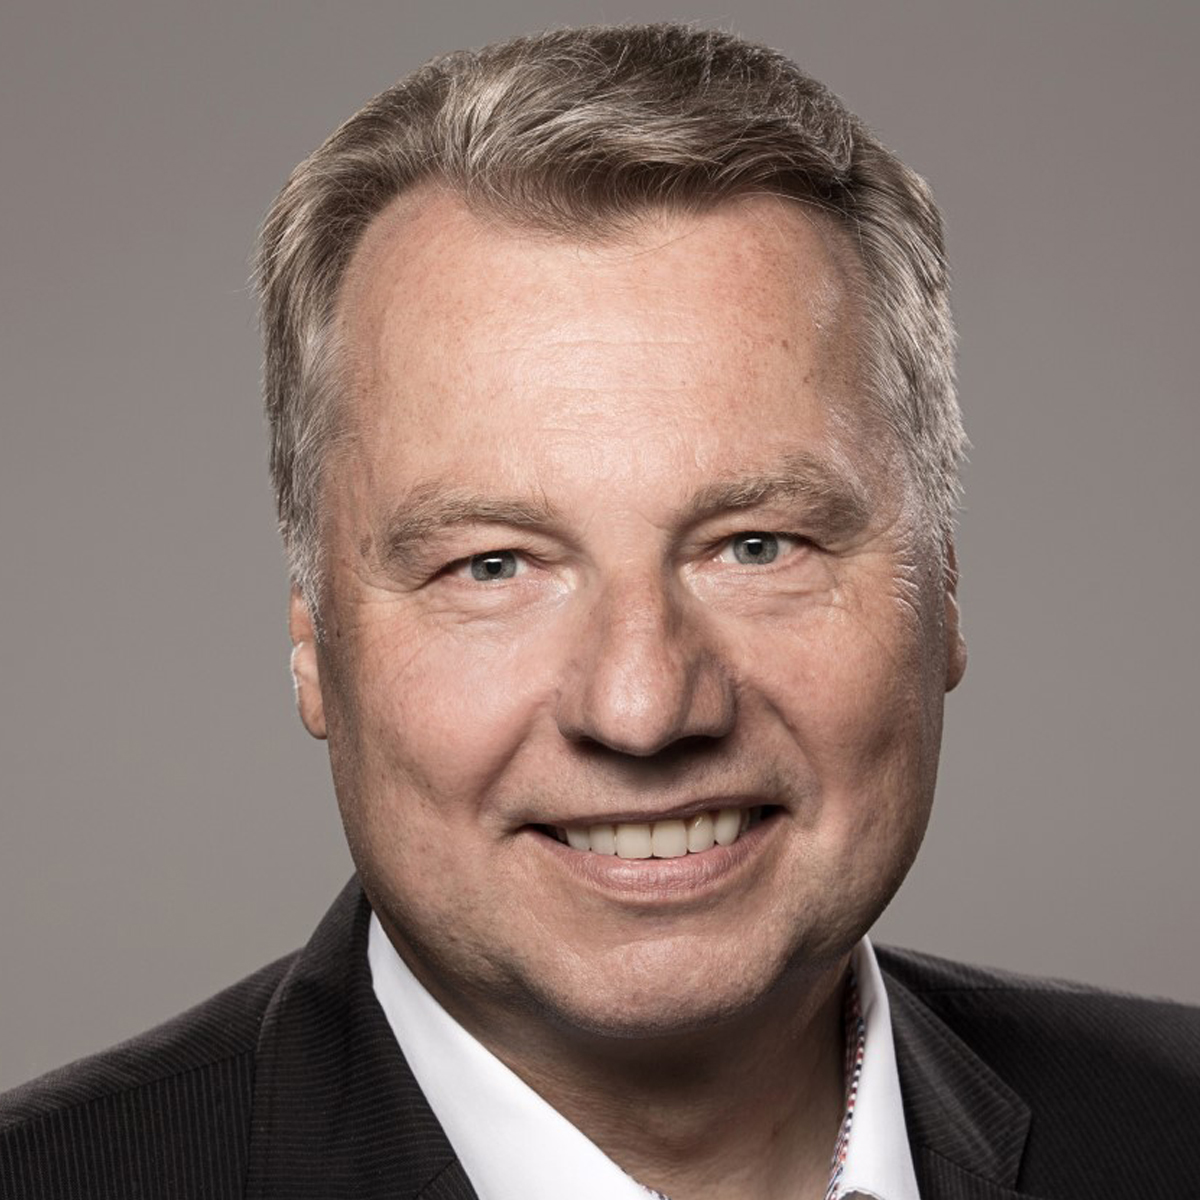 Ingolf F. Brauner